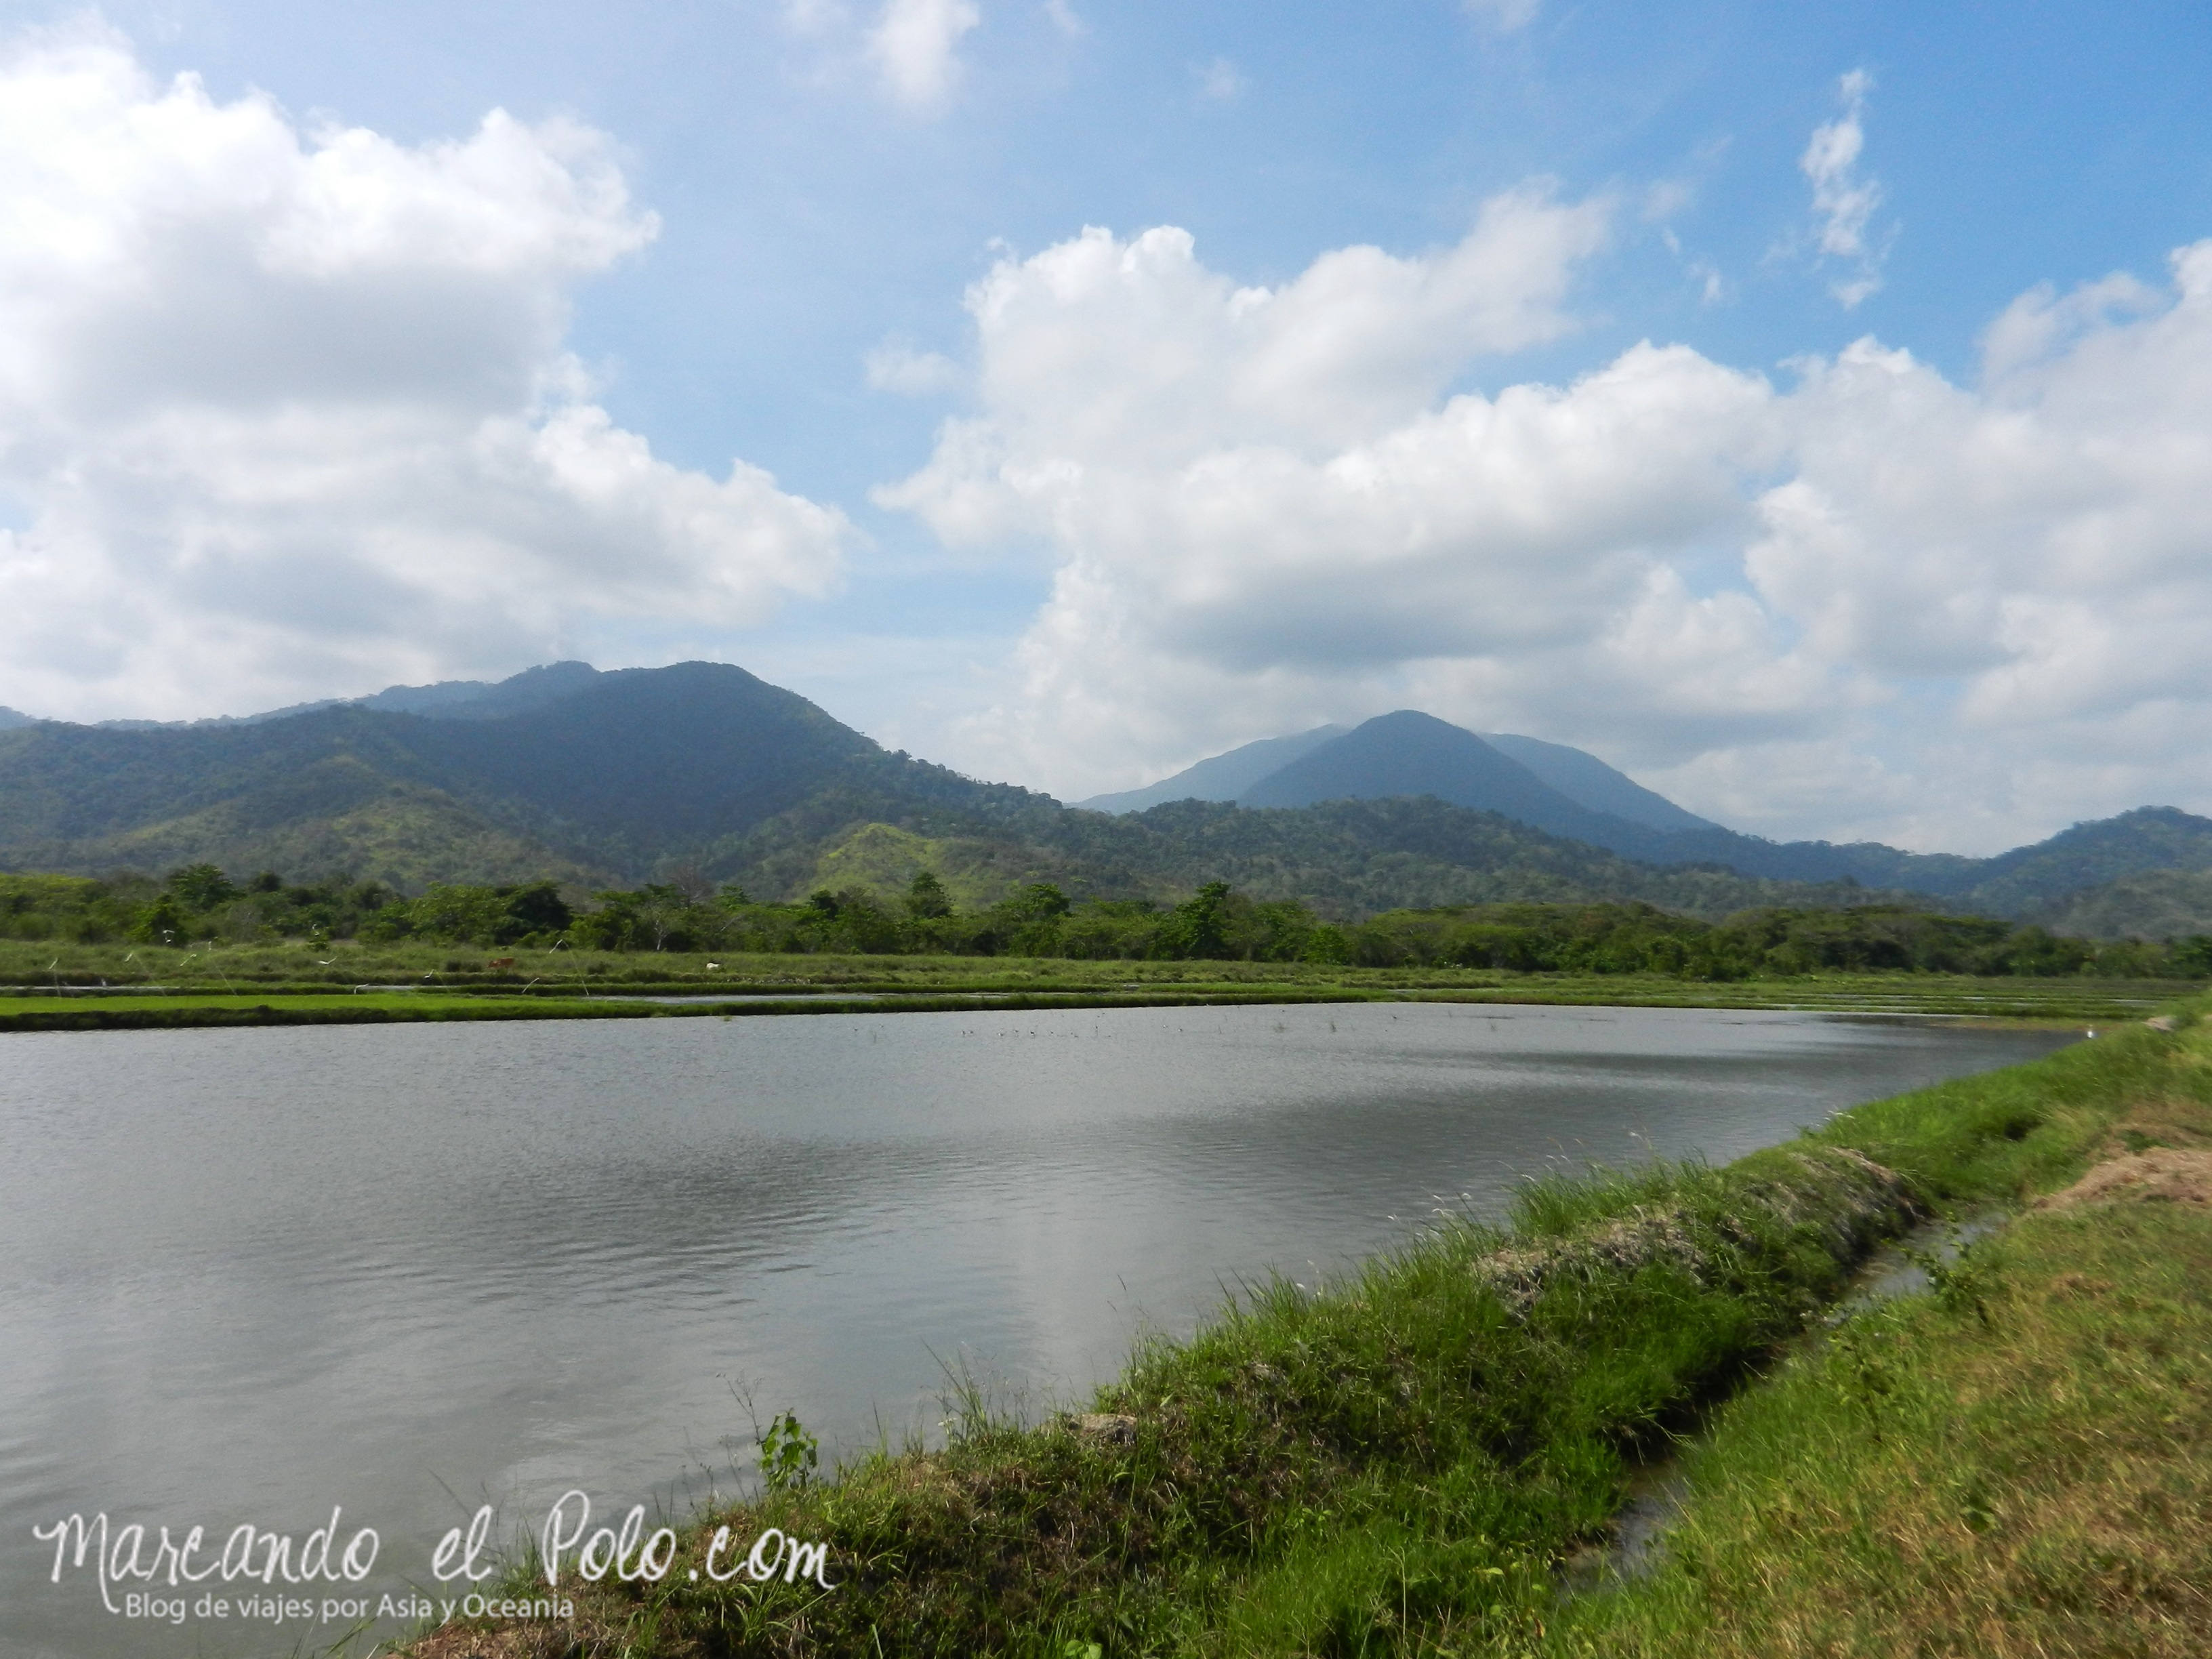 Cárcel sin rejas, Filipinas: paisajes en Iwahig